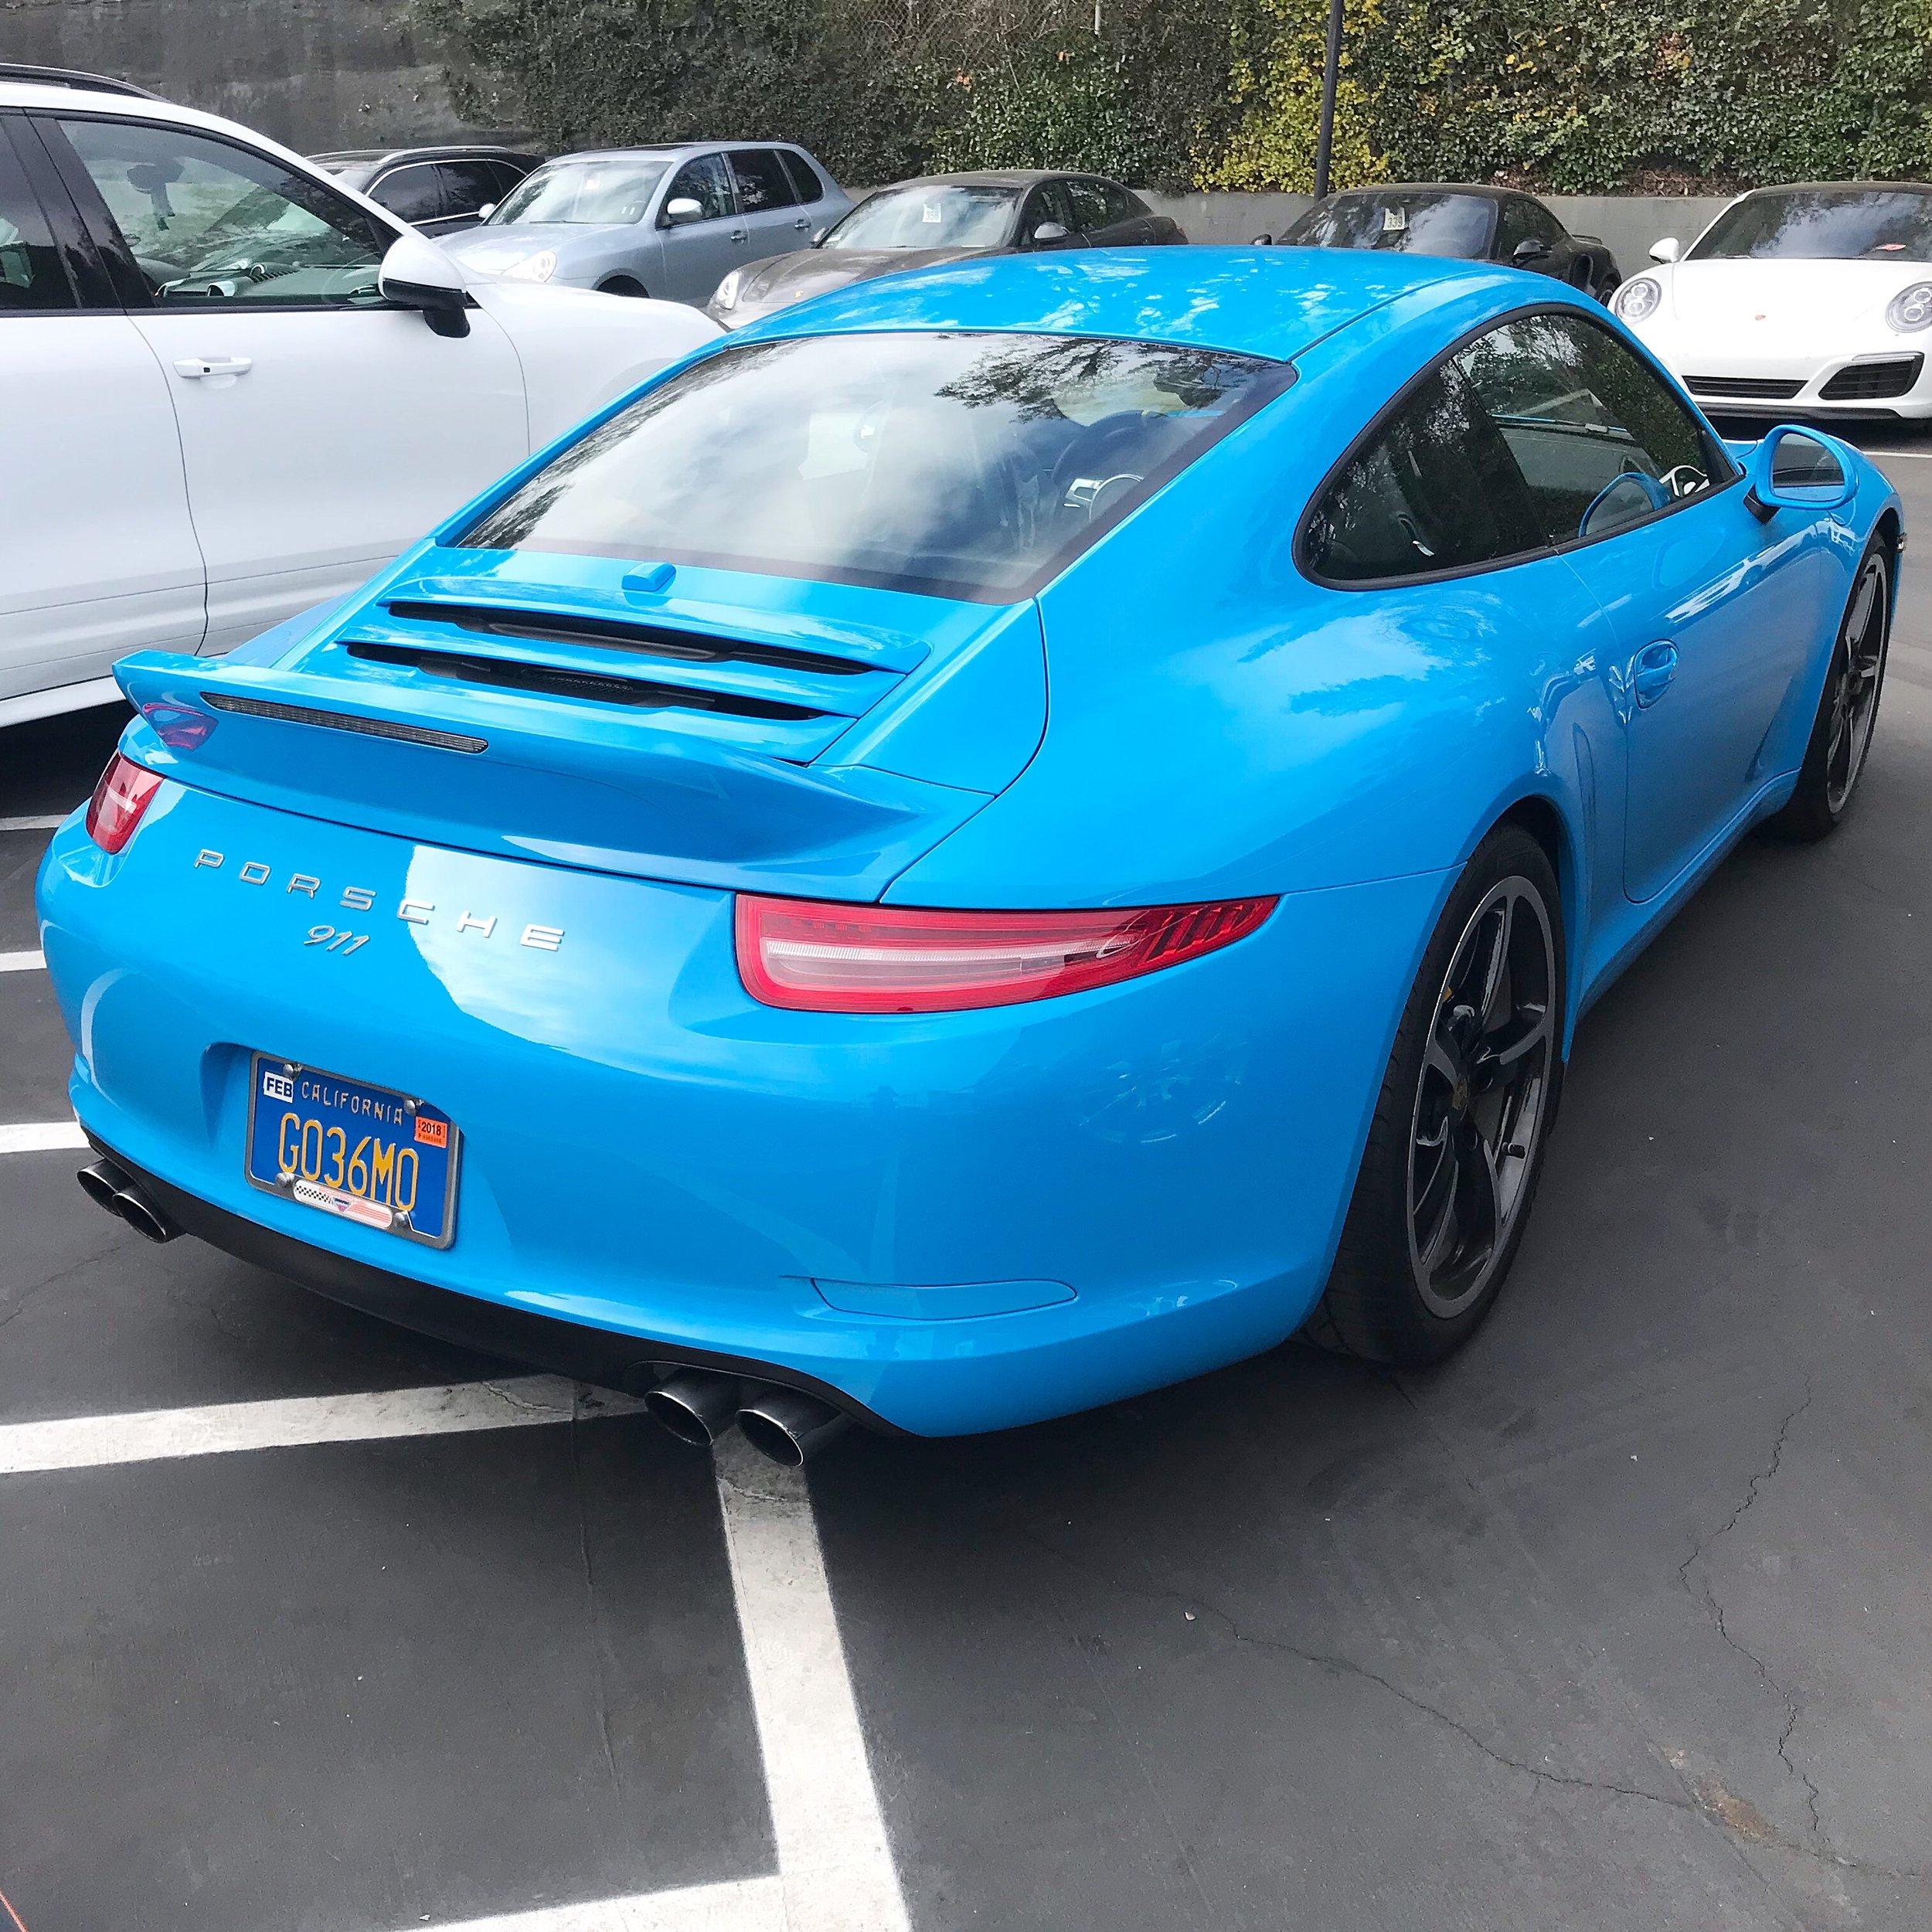 Porsche 991/ 991.2 911 Carrera/ Turbo/ Turbo S/ GT3/ GT3RS/ GT2RS